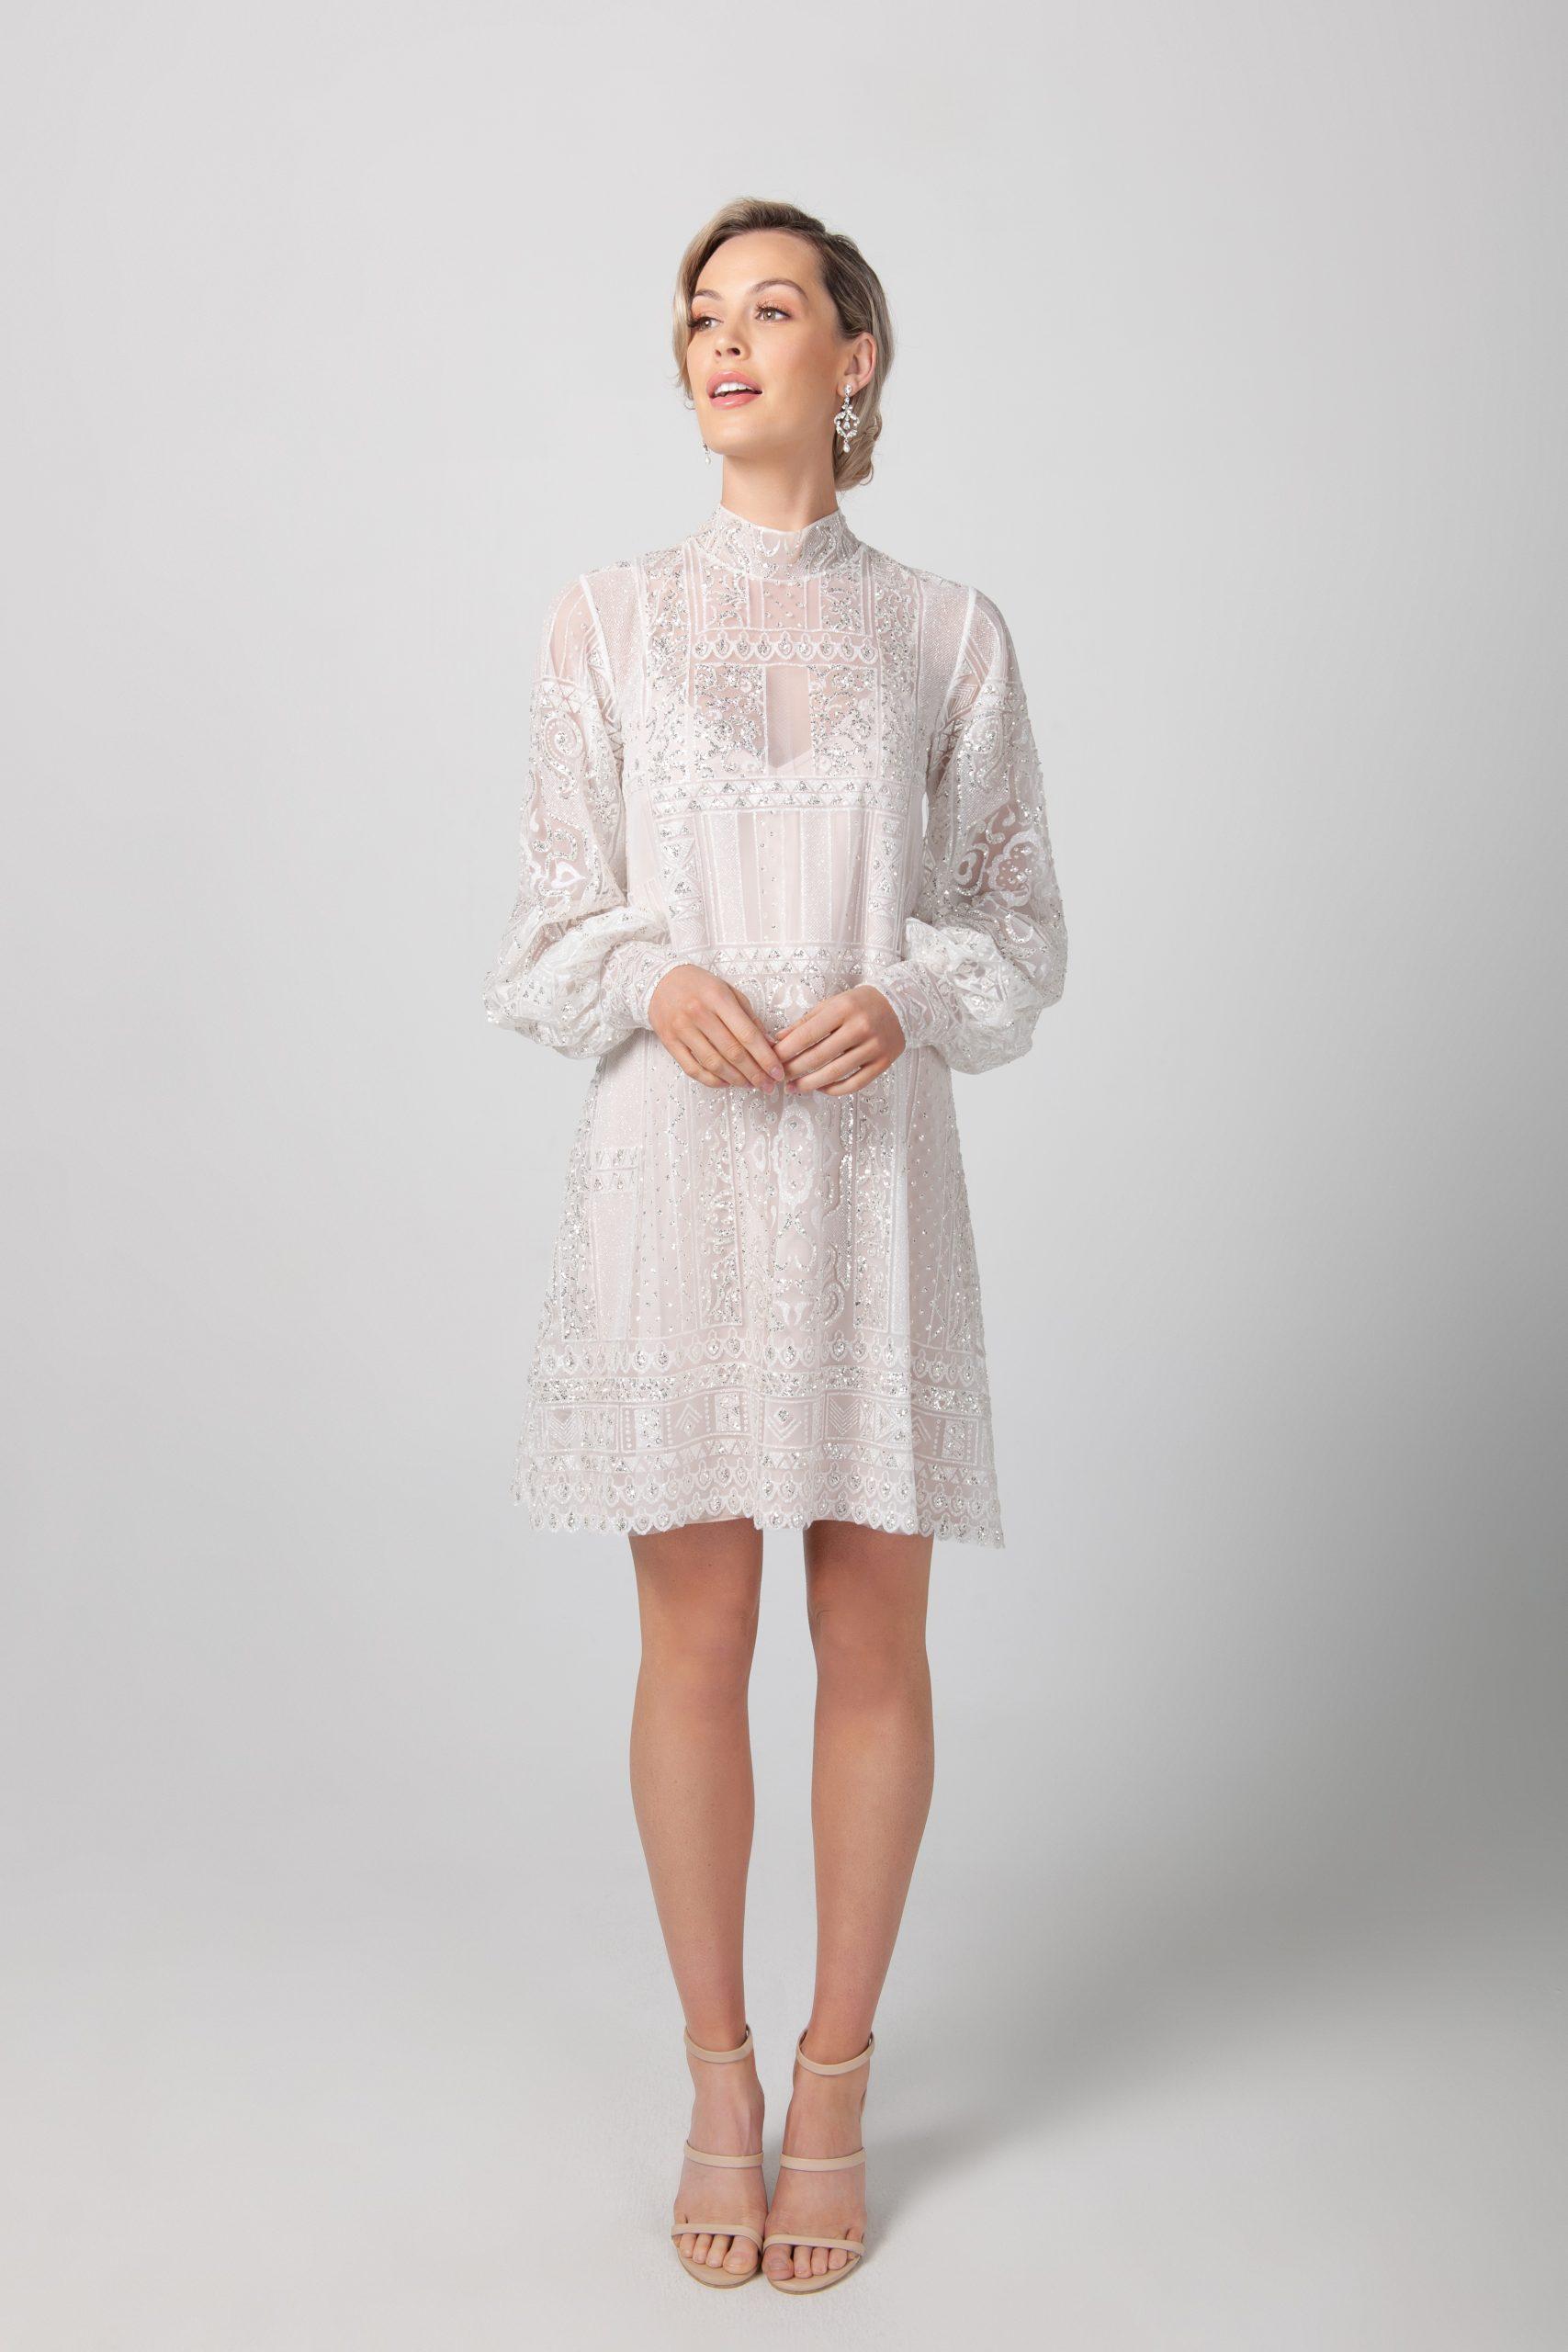 Long Sleeve High Neckline Short Lace Wedding Dress Kleinfeld Bridal